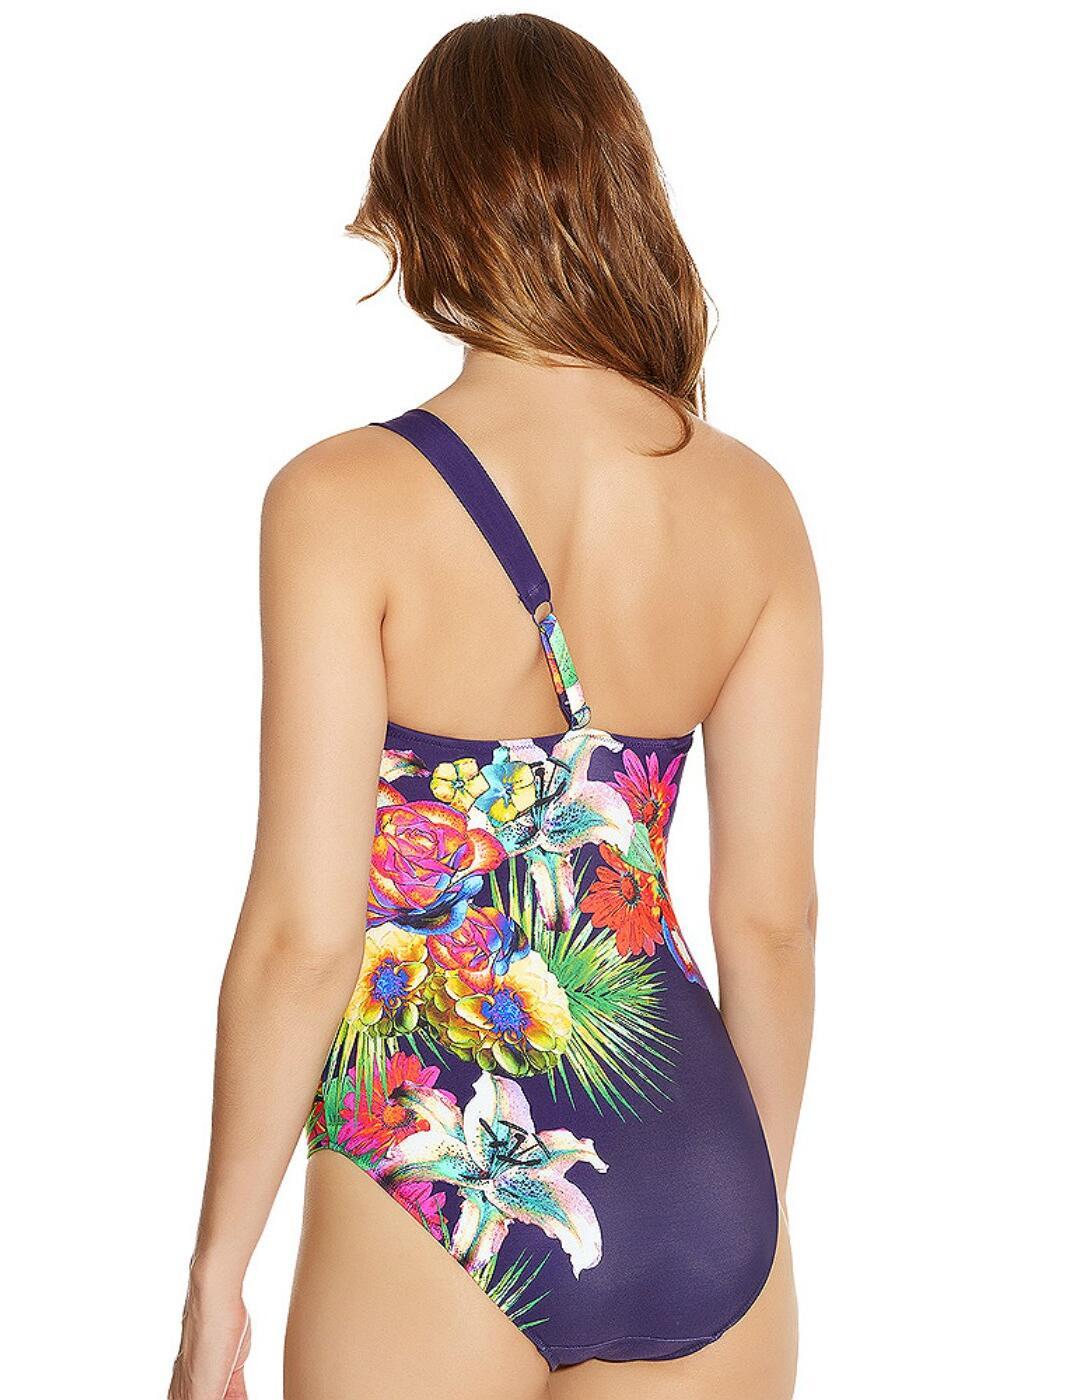 Fantasie Swimwear Cayman Asymmetric Swimsuit//Swimming Costume Multi 5691